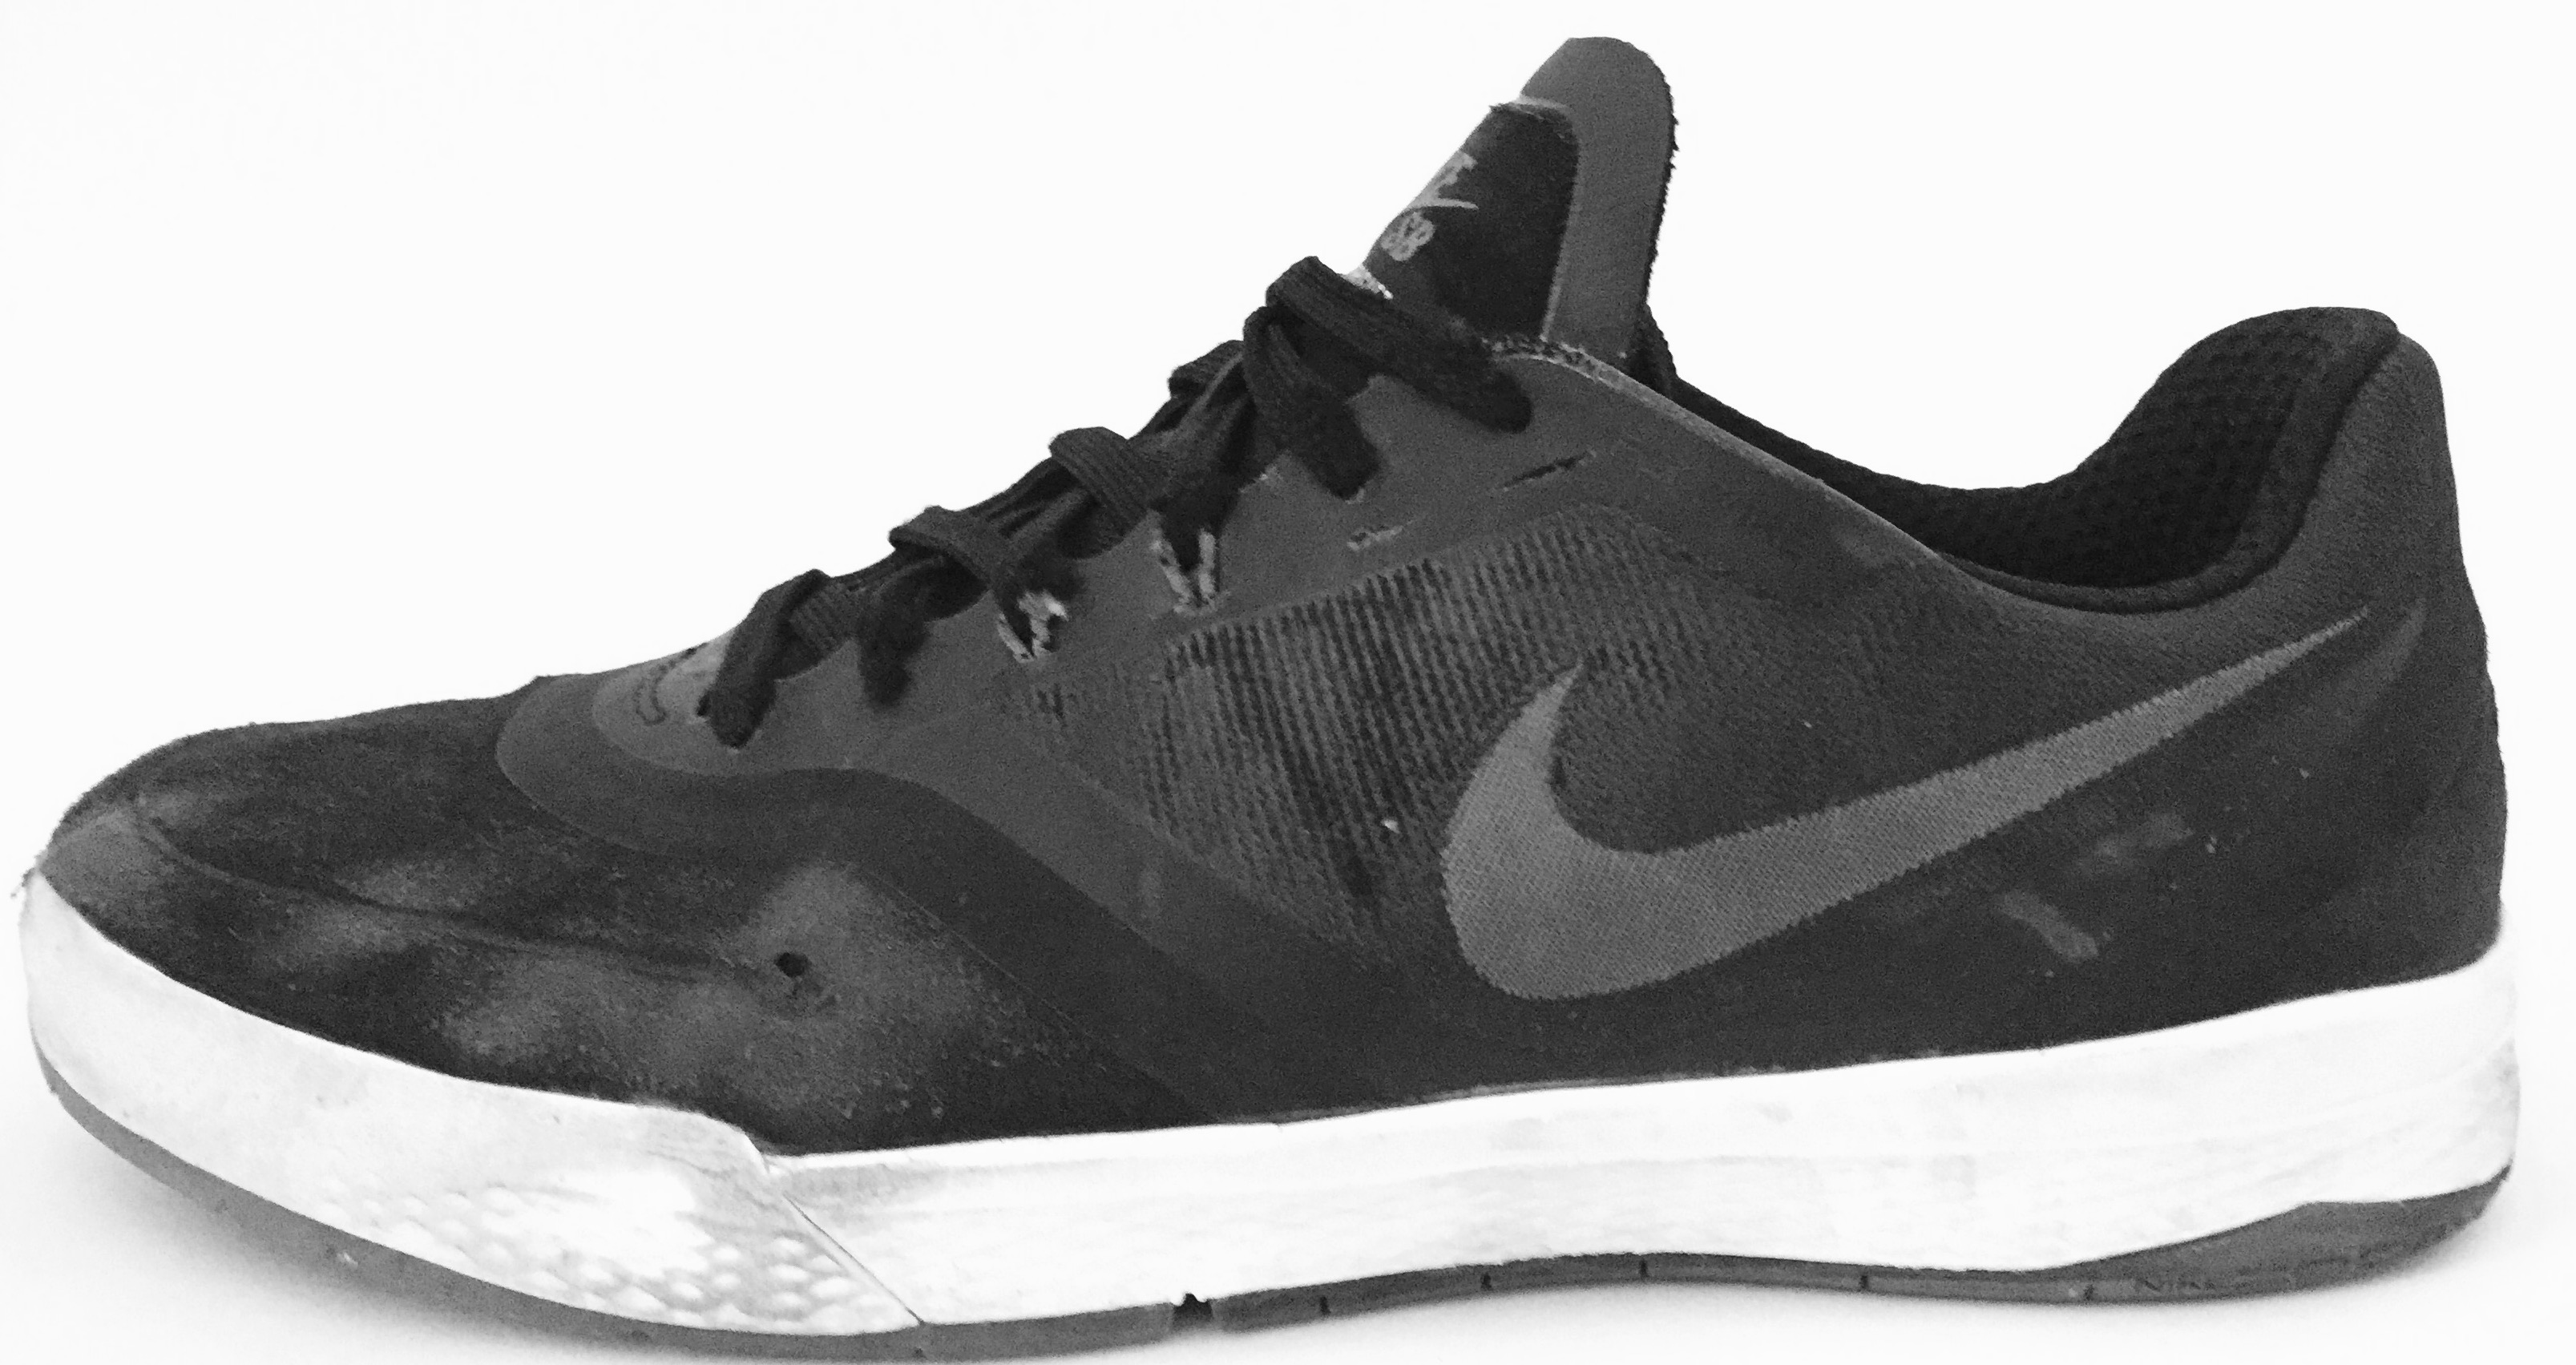 Nike SB Paul Rodriguez P-Rod 9